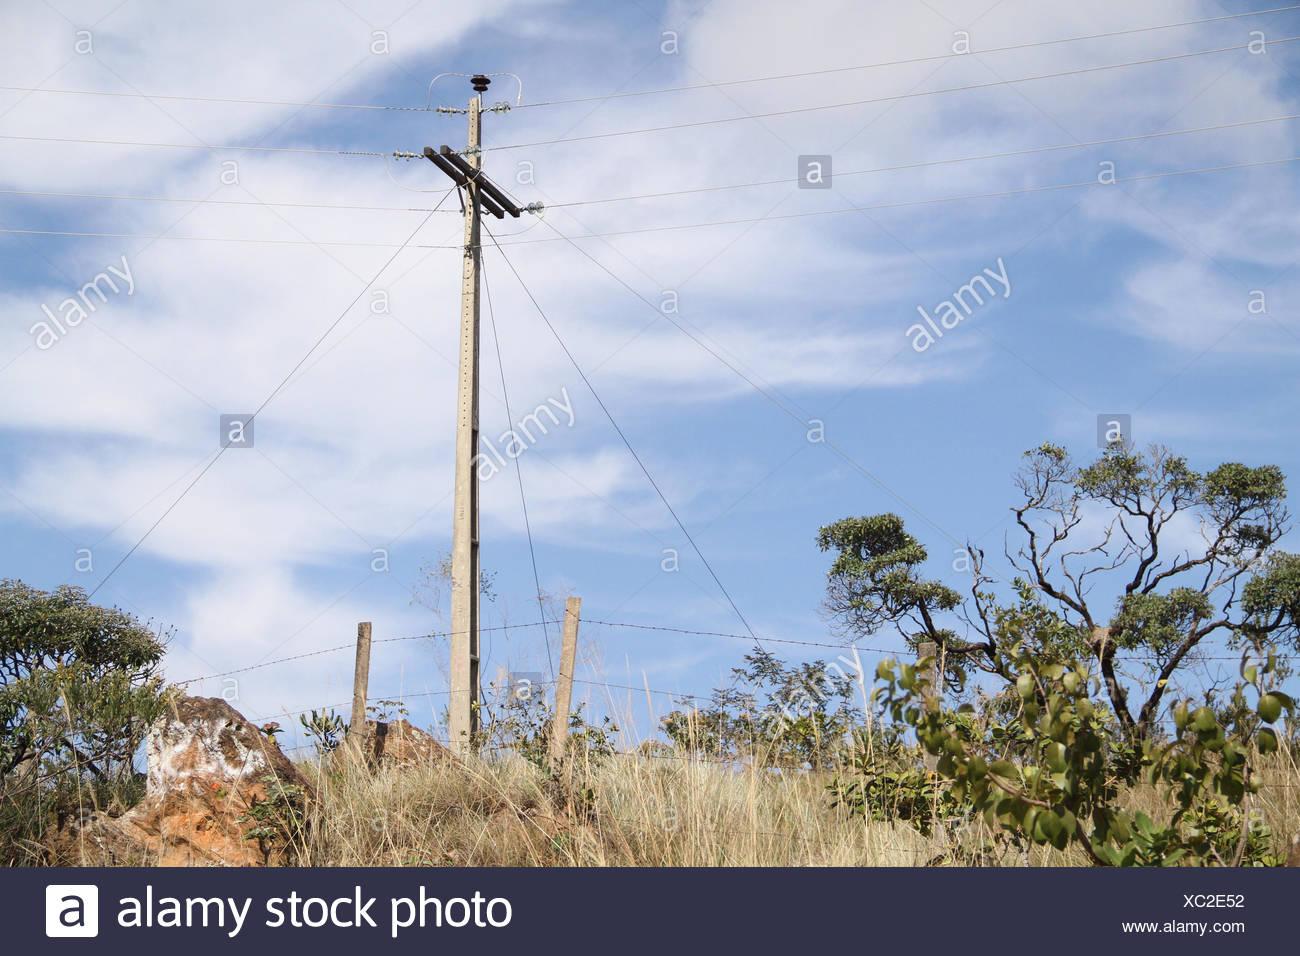 Post, wires, Highway MGC 354, 2016, Lavras, Minas Gerais, Brazil. - Stock Image